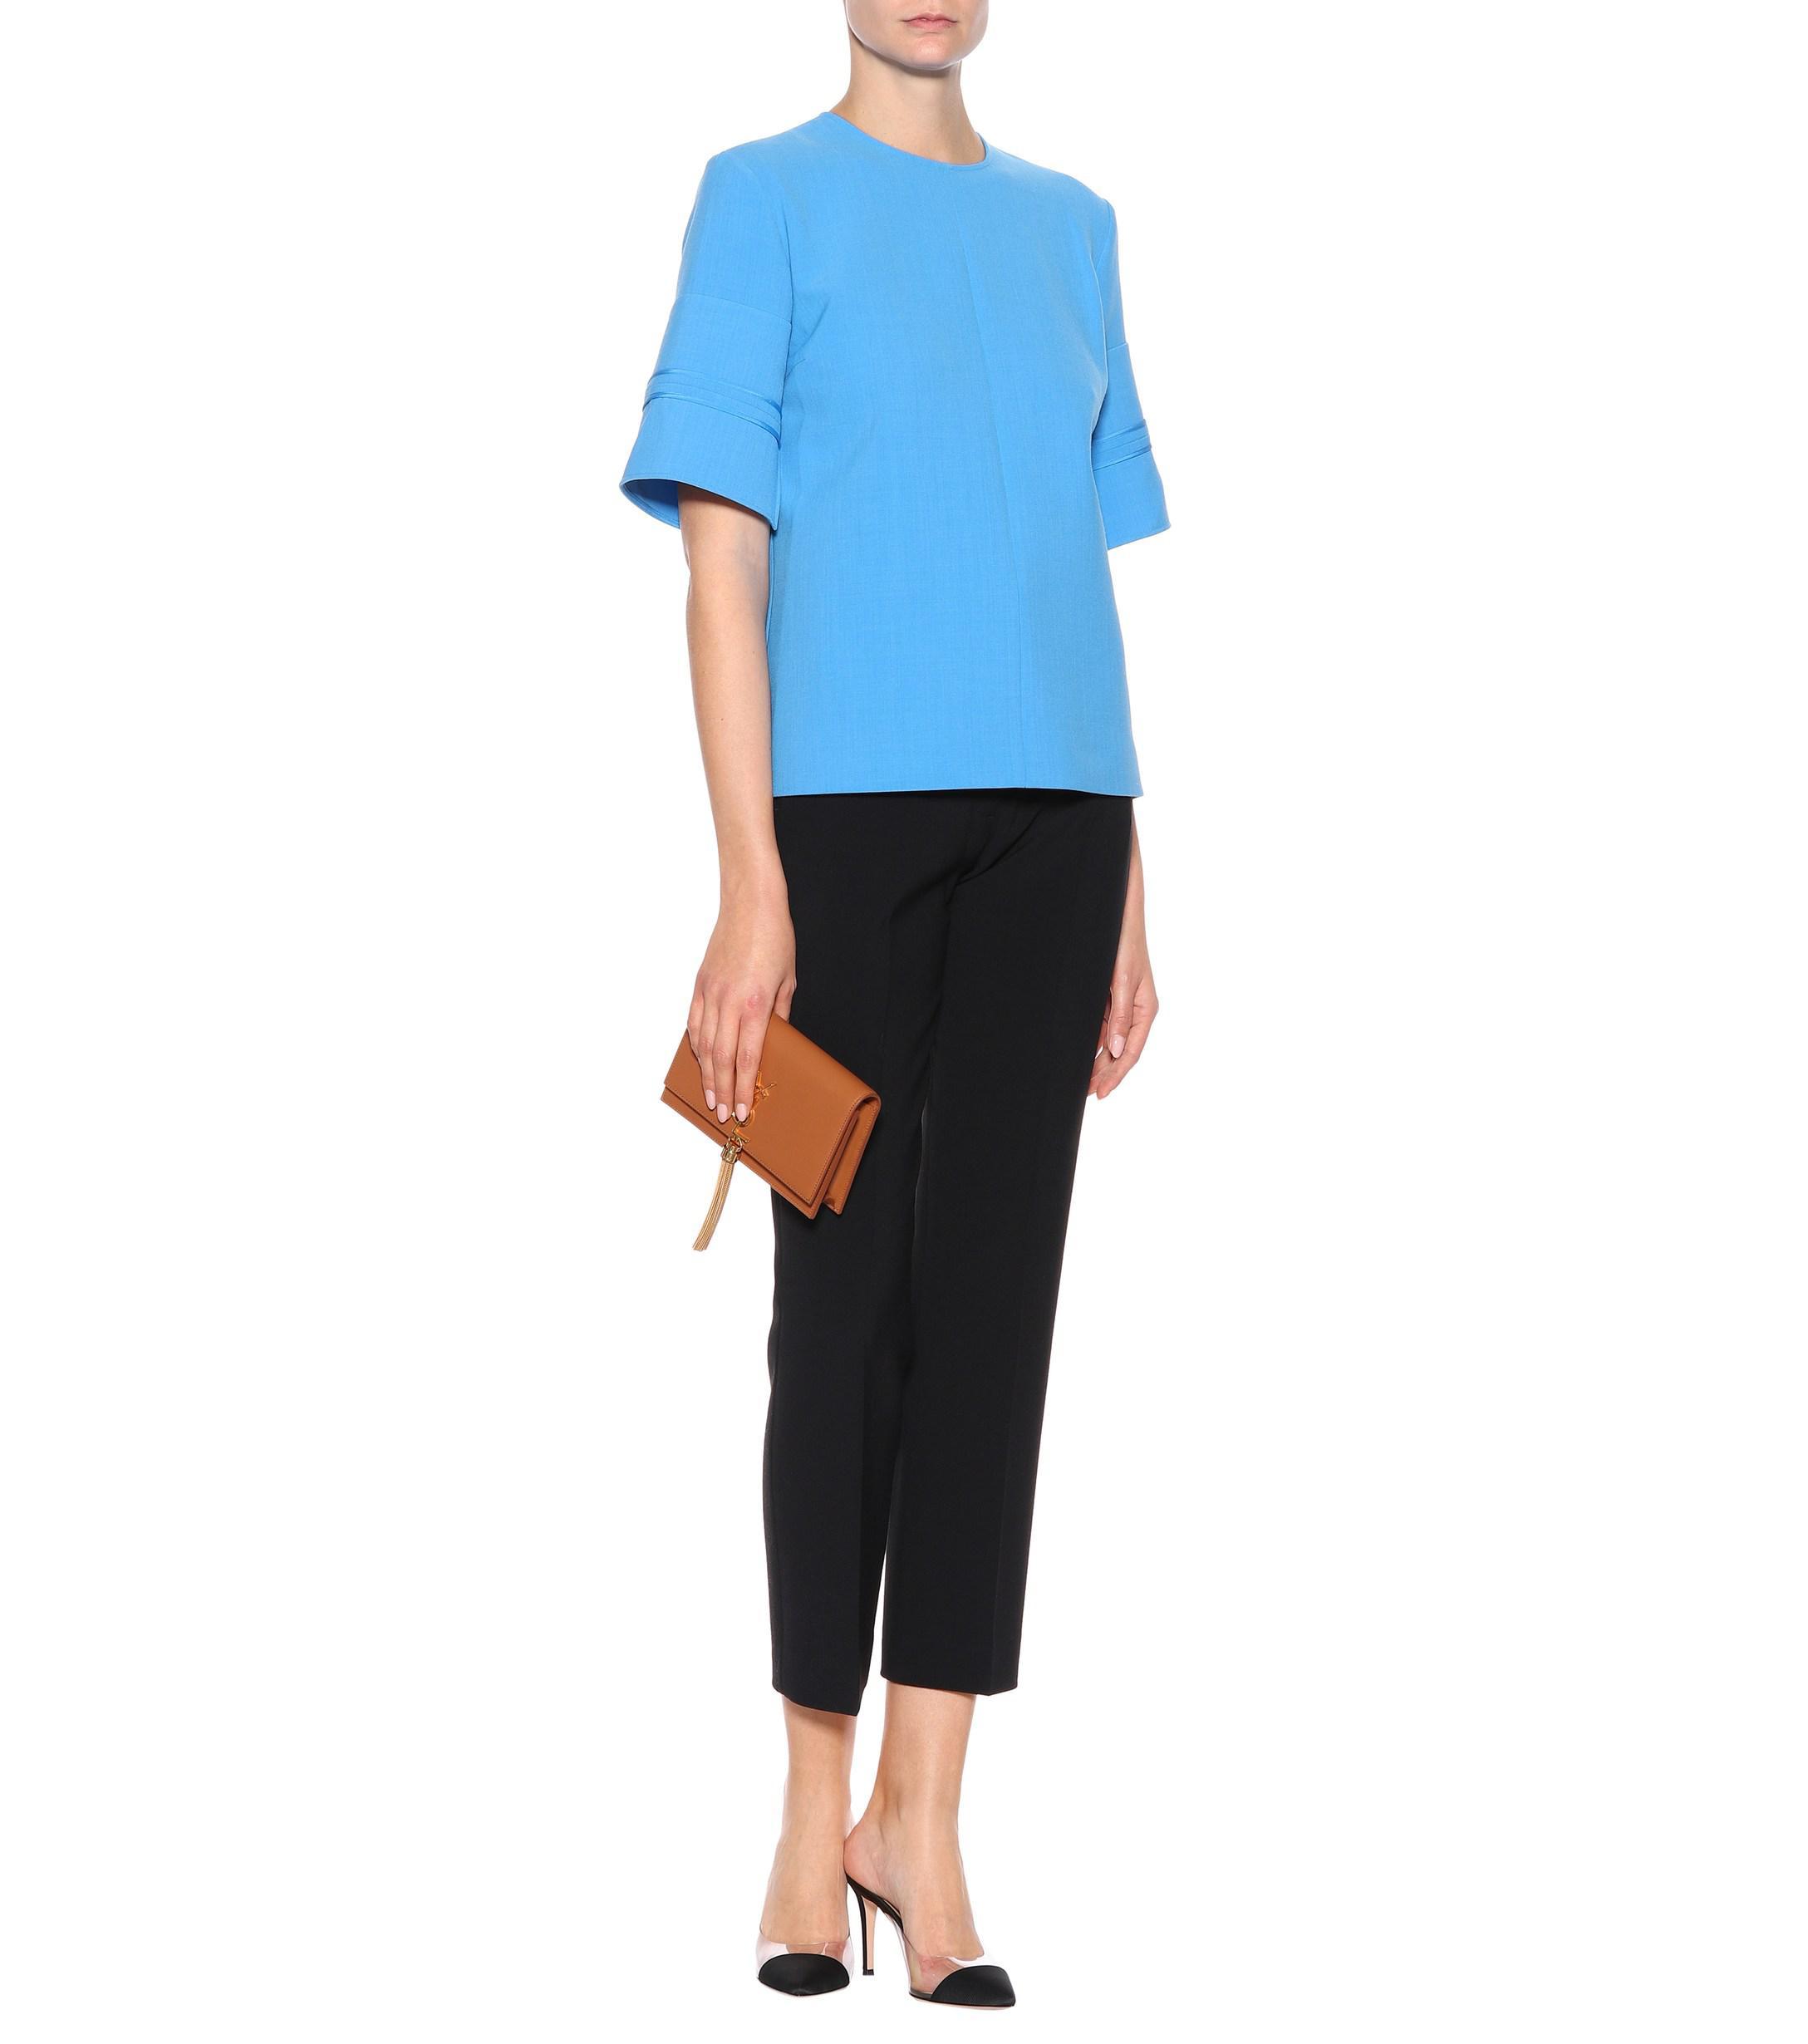 Victoria Beckham T Crêpe Blue Shirt Victoria Lyst In 4CEdqvC